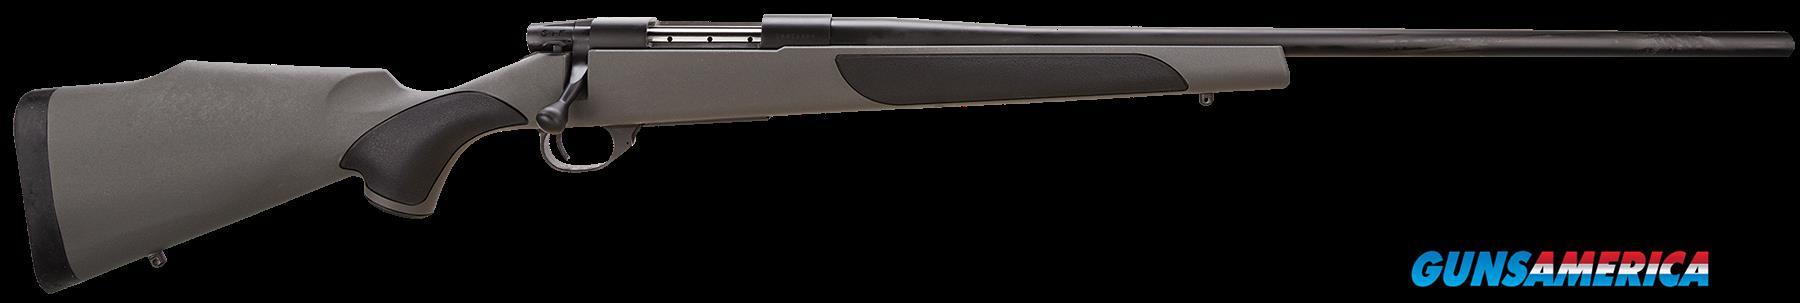 Weatherby Vanguard, Wthby Vgt7m8rr4o Vgd 7mm-08  Guns > Pistols > 1911 Pistol Copies (non-Colt)